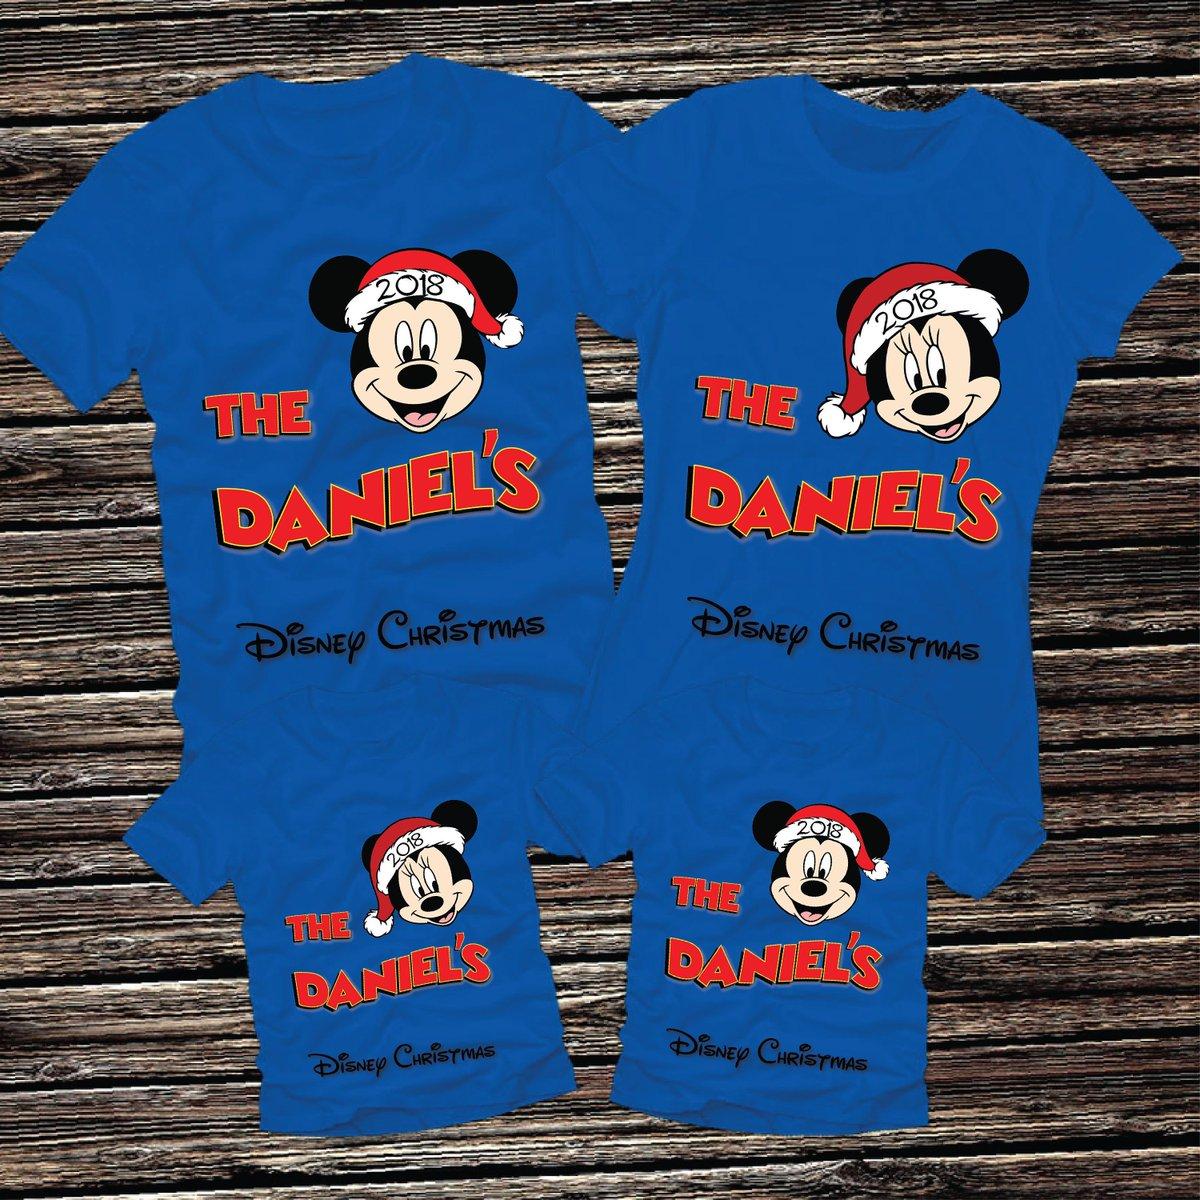 bcf74eafe3e20 ... Disney Christmas Shirts~Disney Family Shirts~Mickey Head Minnie head Christmas  Shirts,Disney Vacation Christmas Shirts Family,Christmas tees ...